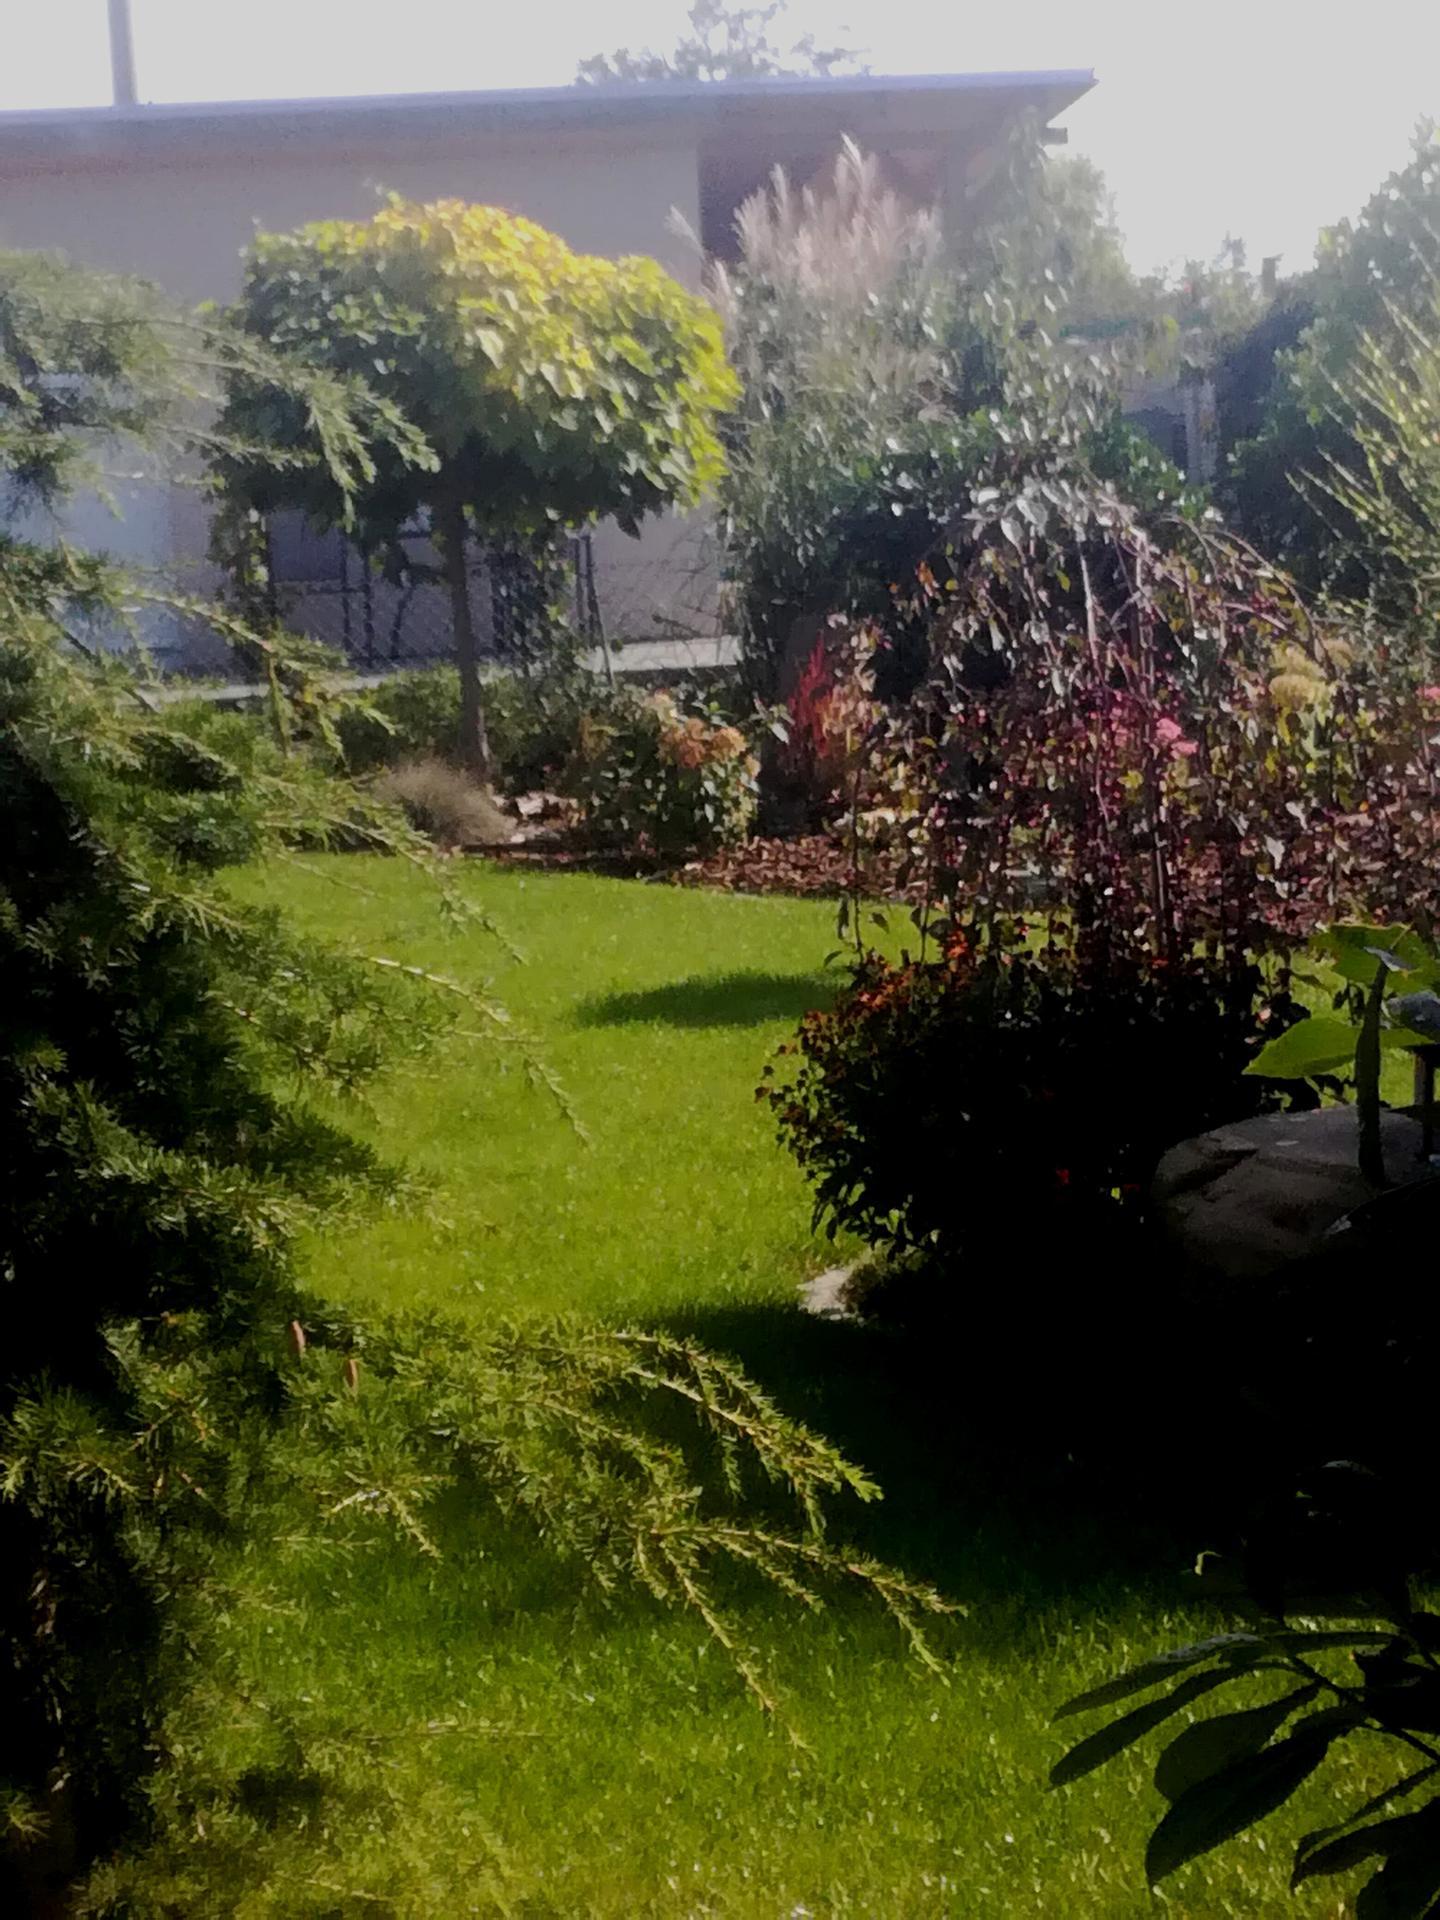 Zahrada 2021 🌲 - Obrázek č. 200